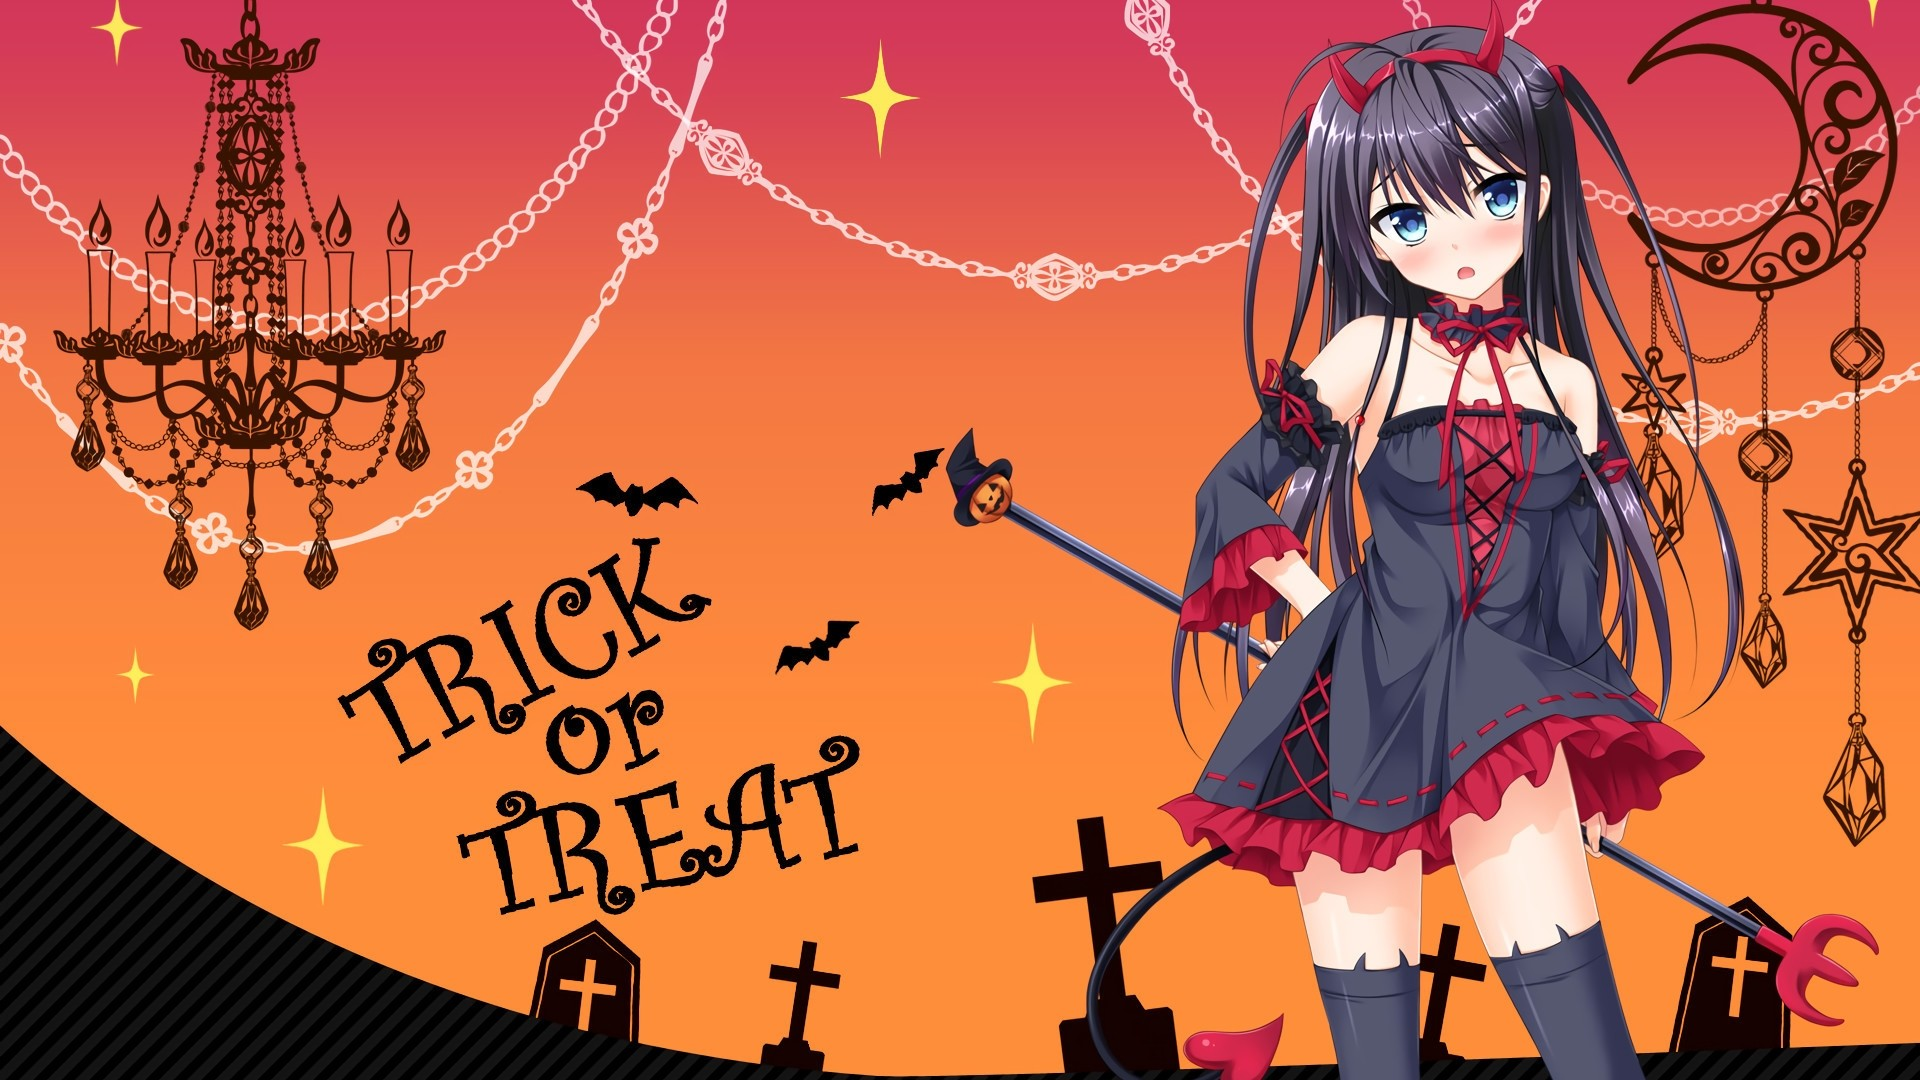 Halloween Anime hd wallpaper download